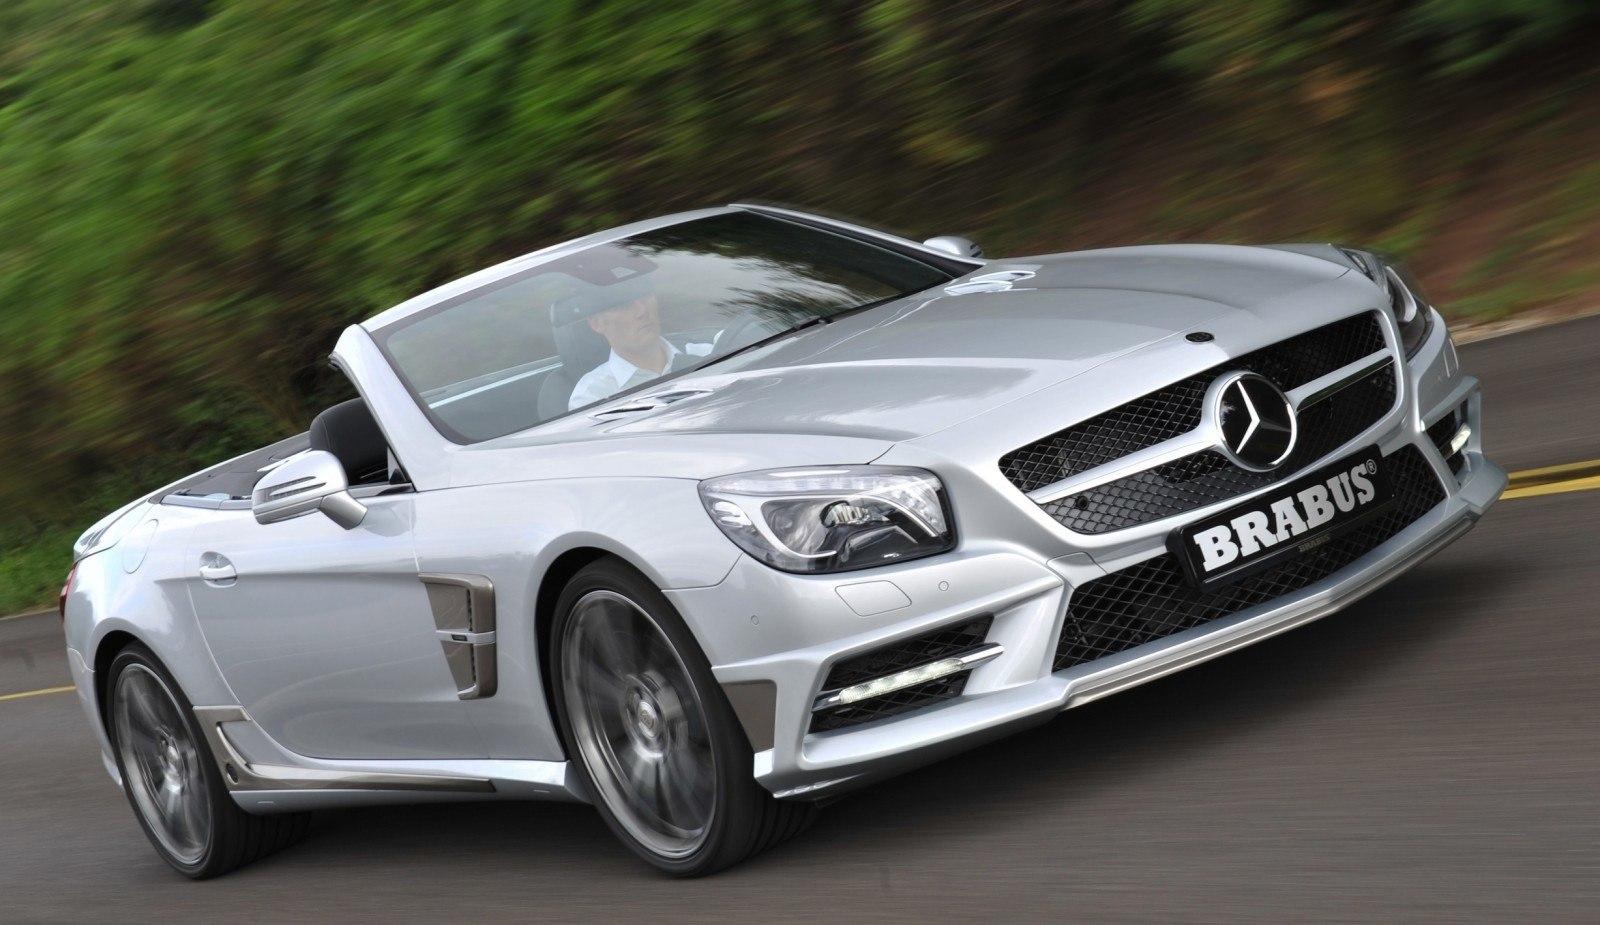 BRABUS Mercedes-Benz SL550 R231 14